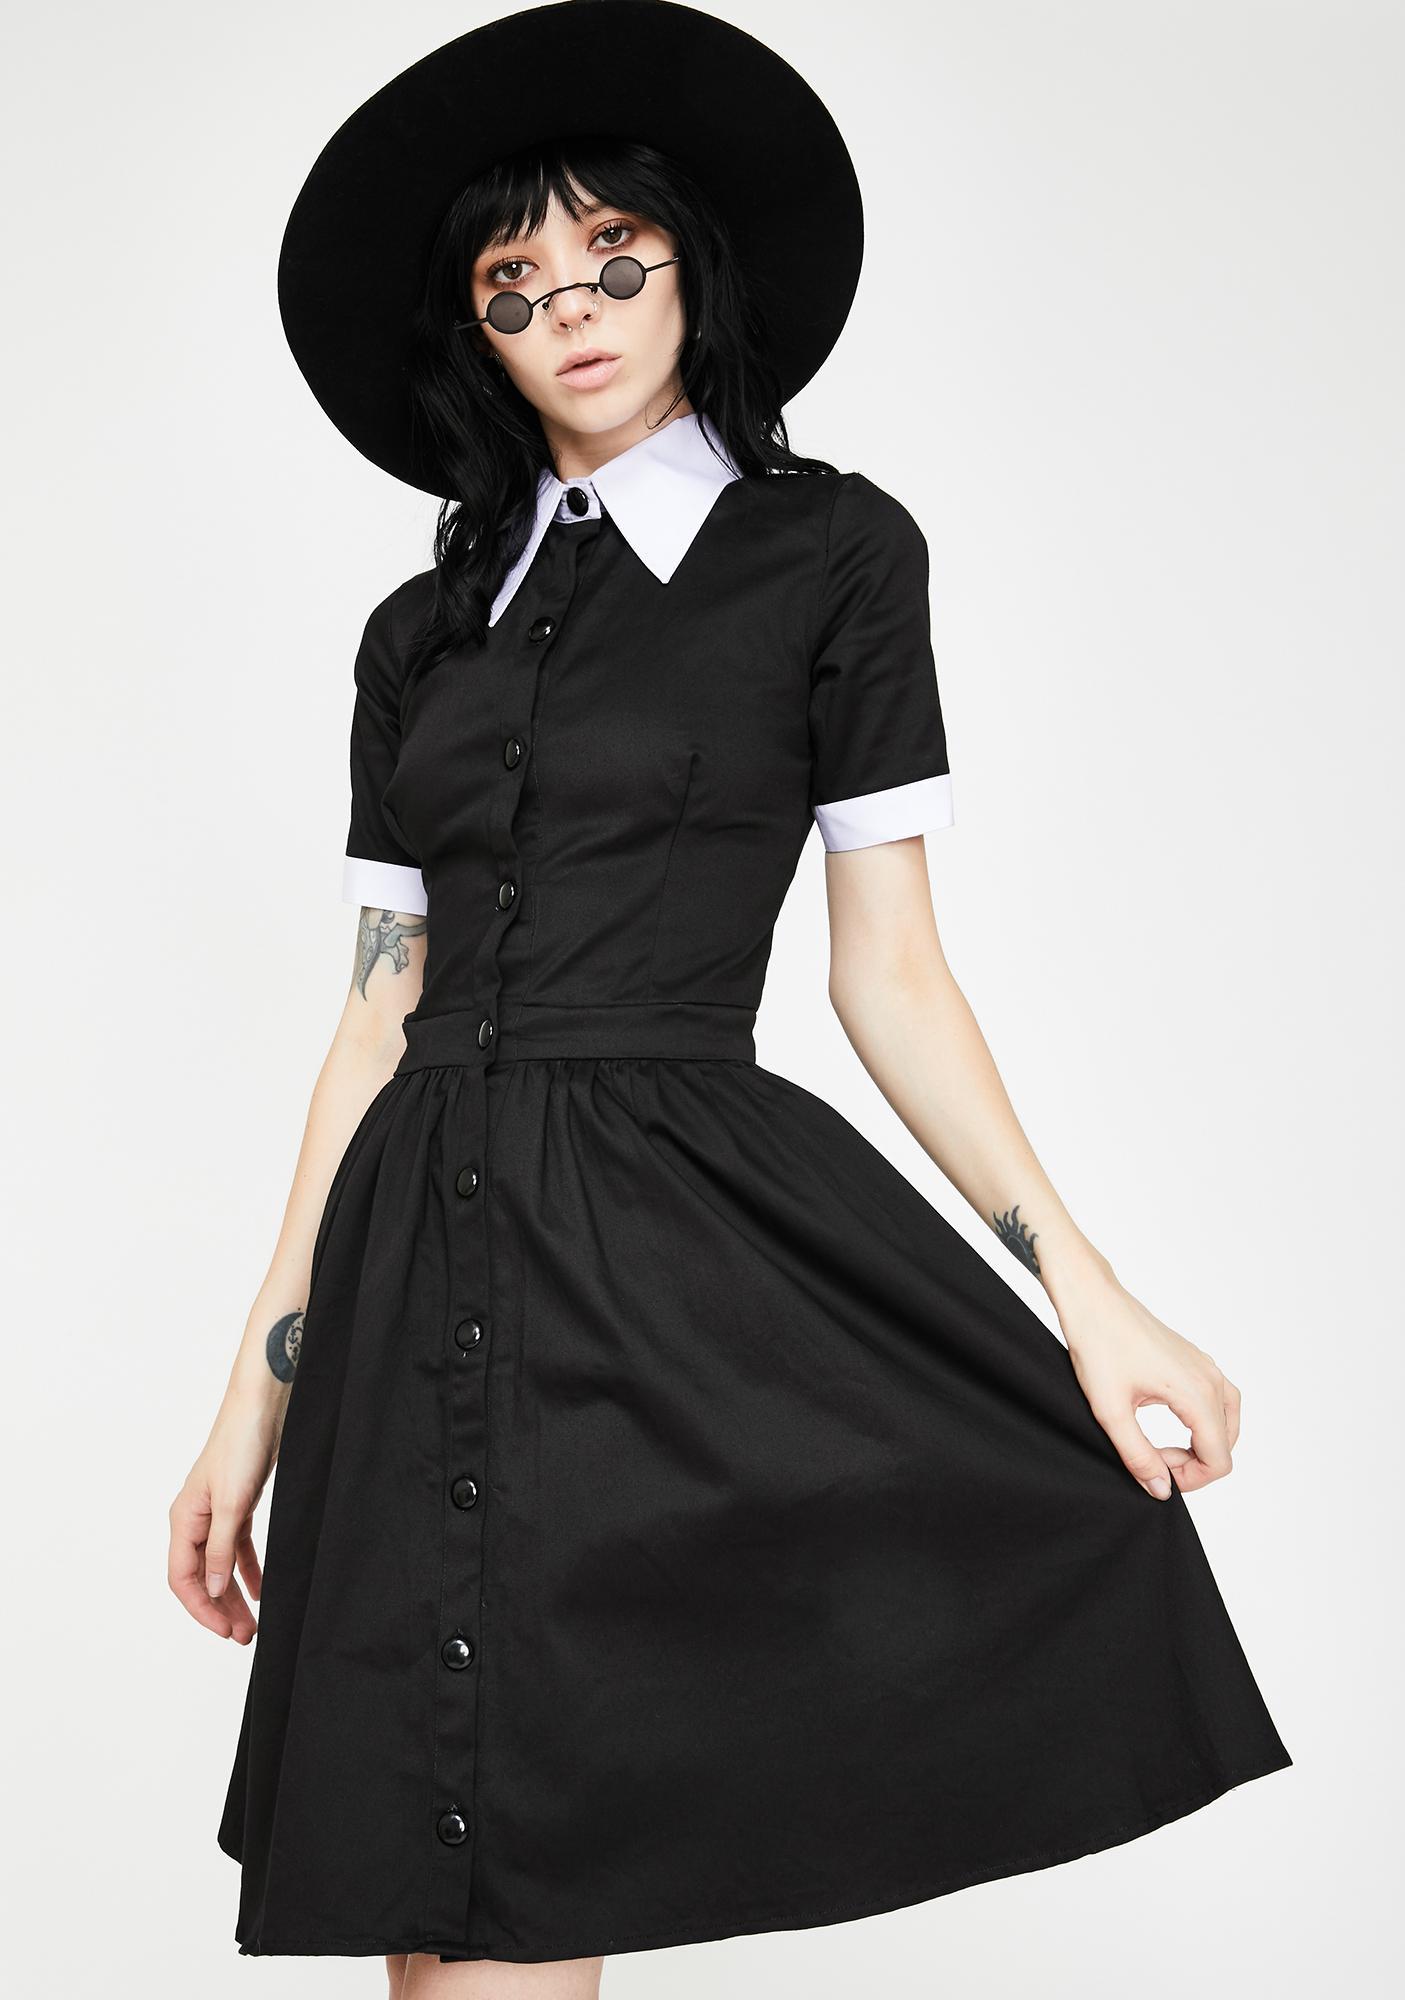 Dr. Faust Wednesday Addams Short Sleeve Mini Dress